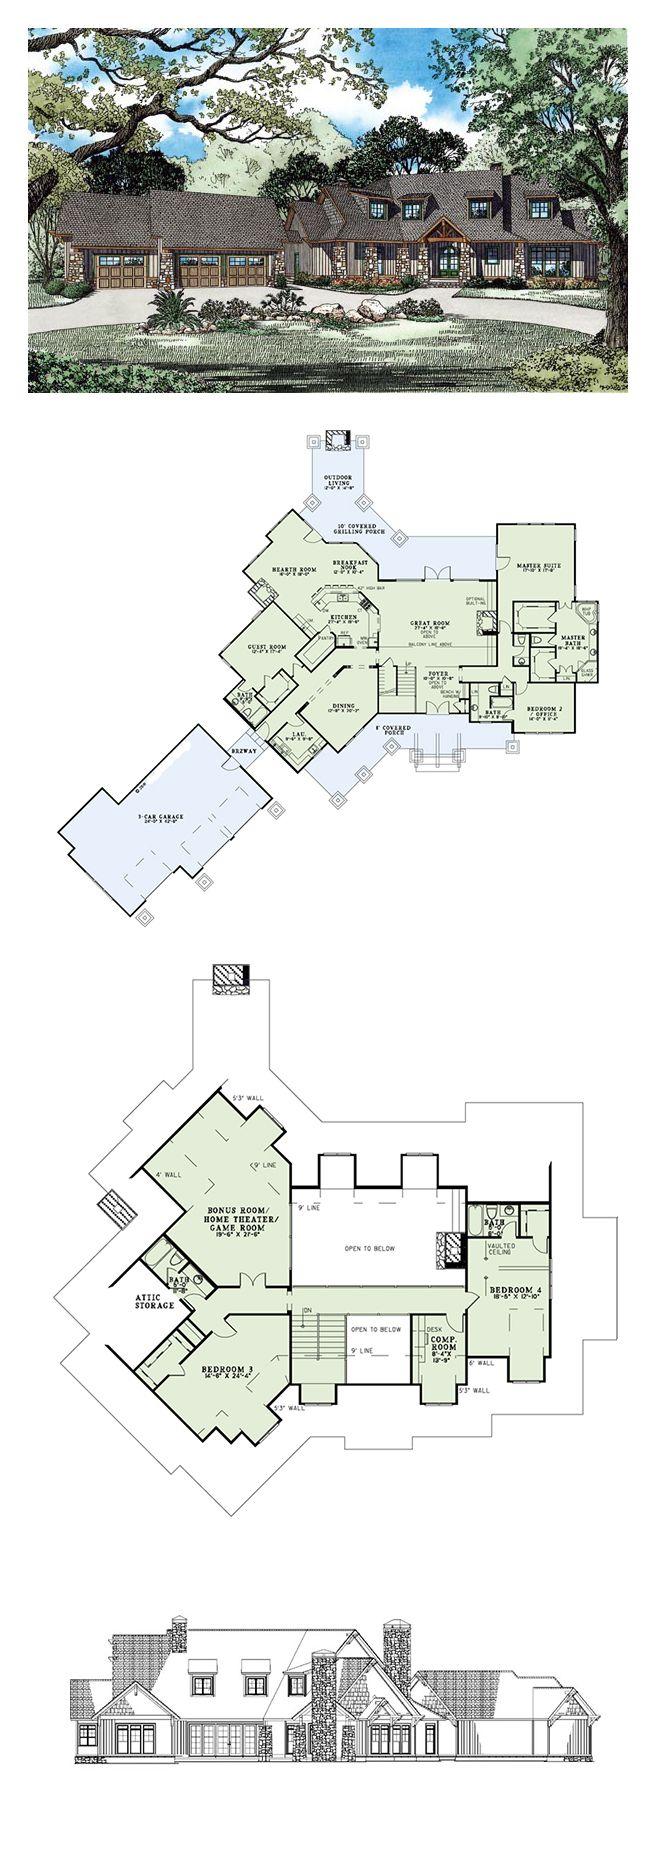 Craftsman european tuscan house plan 82261 beautiful for Detailed house plans